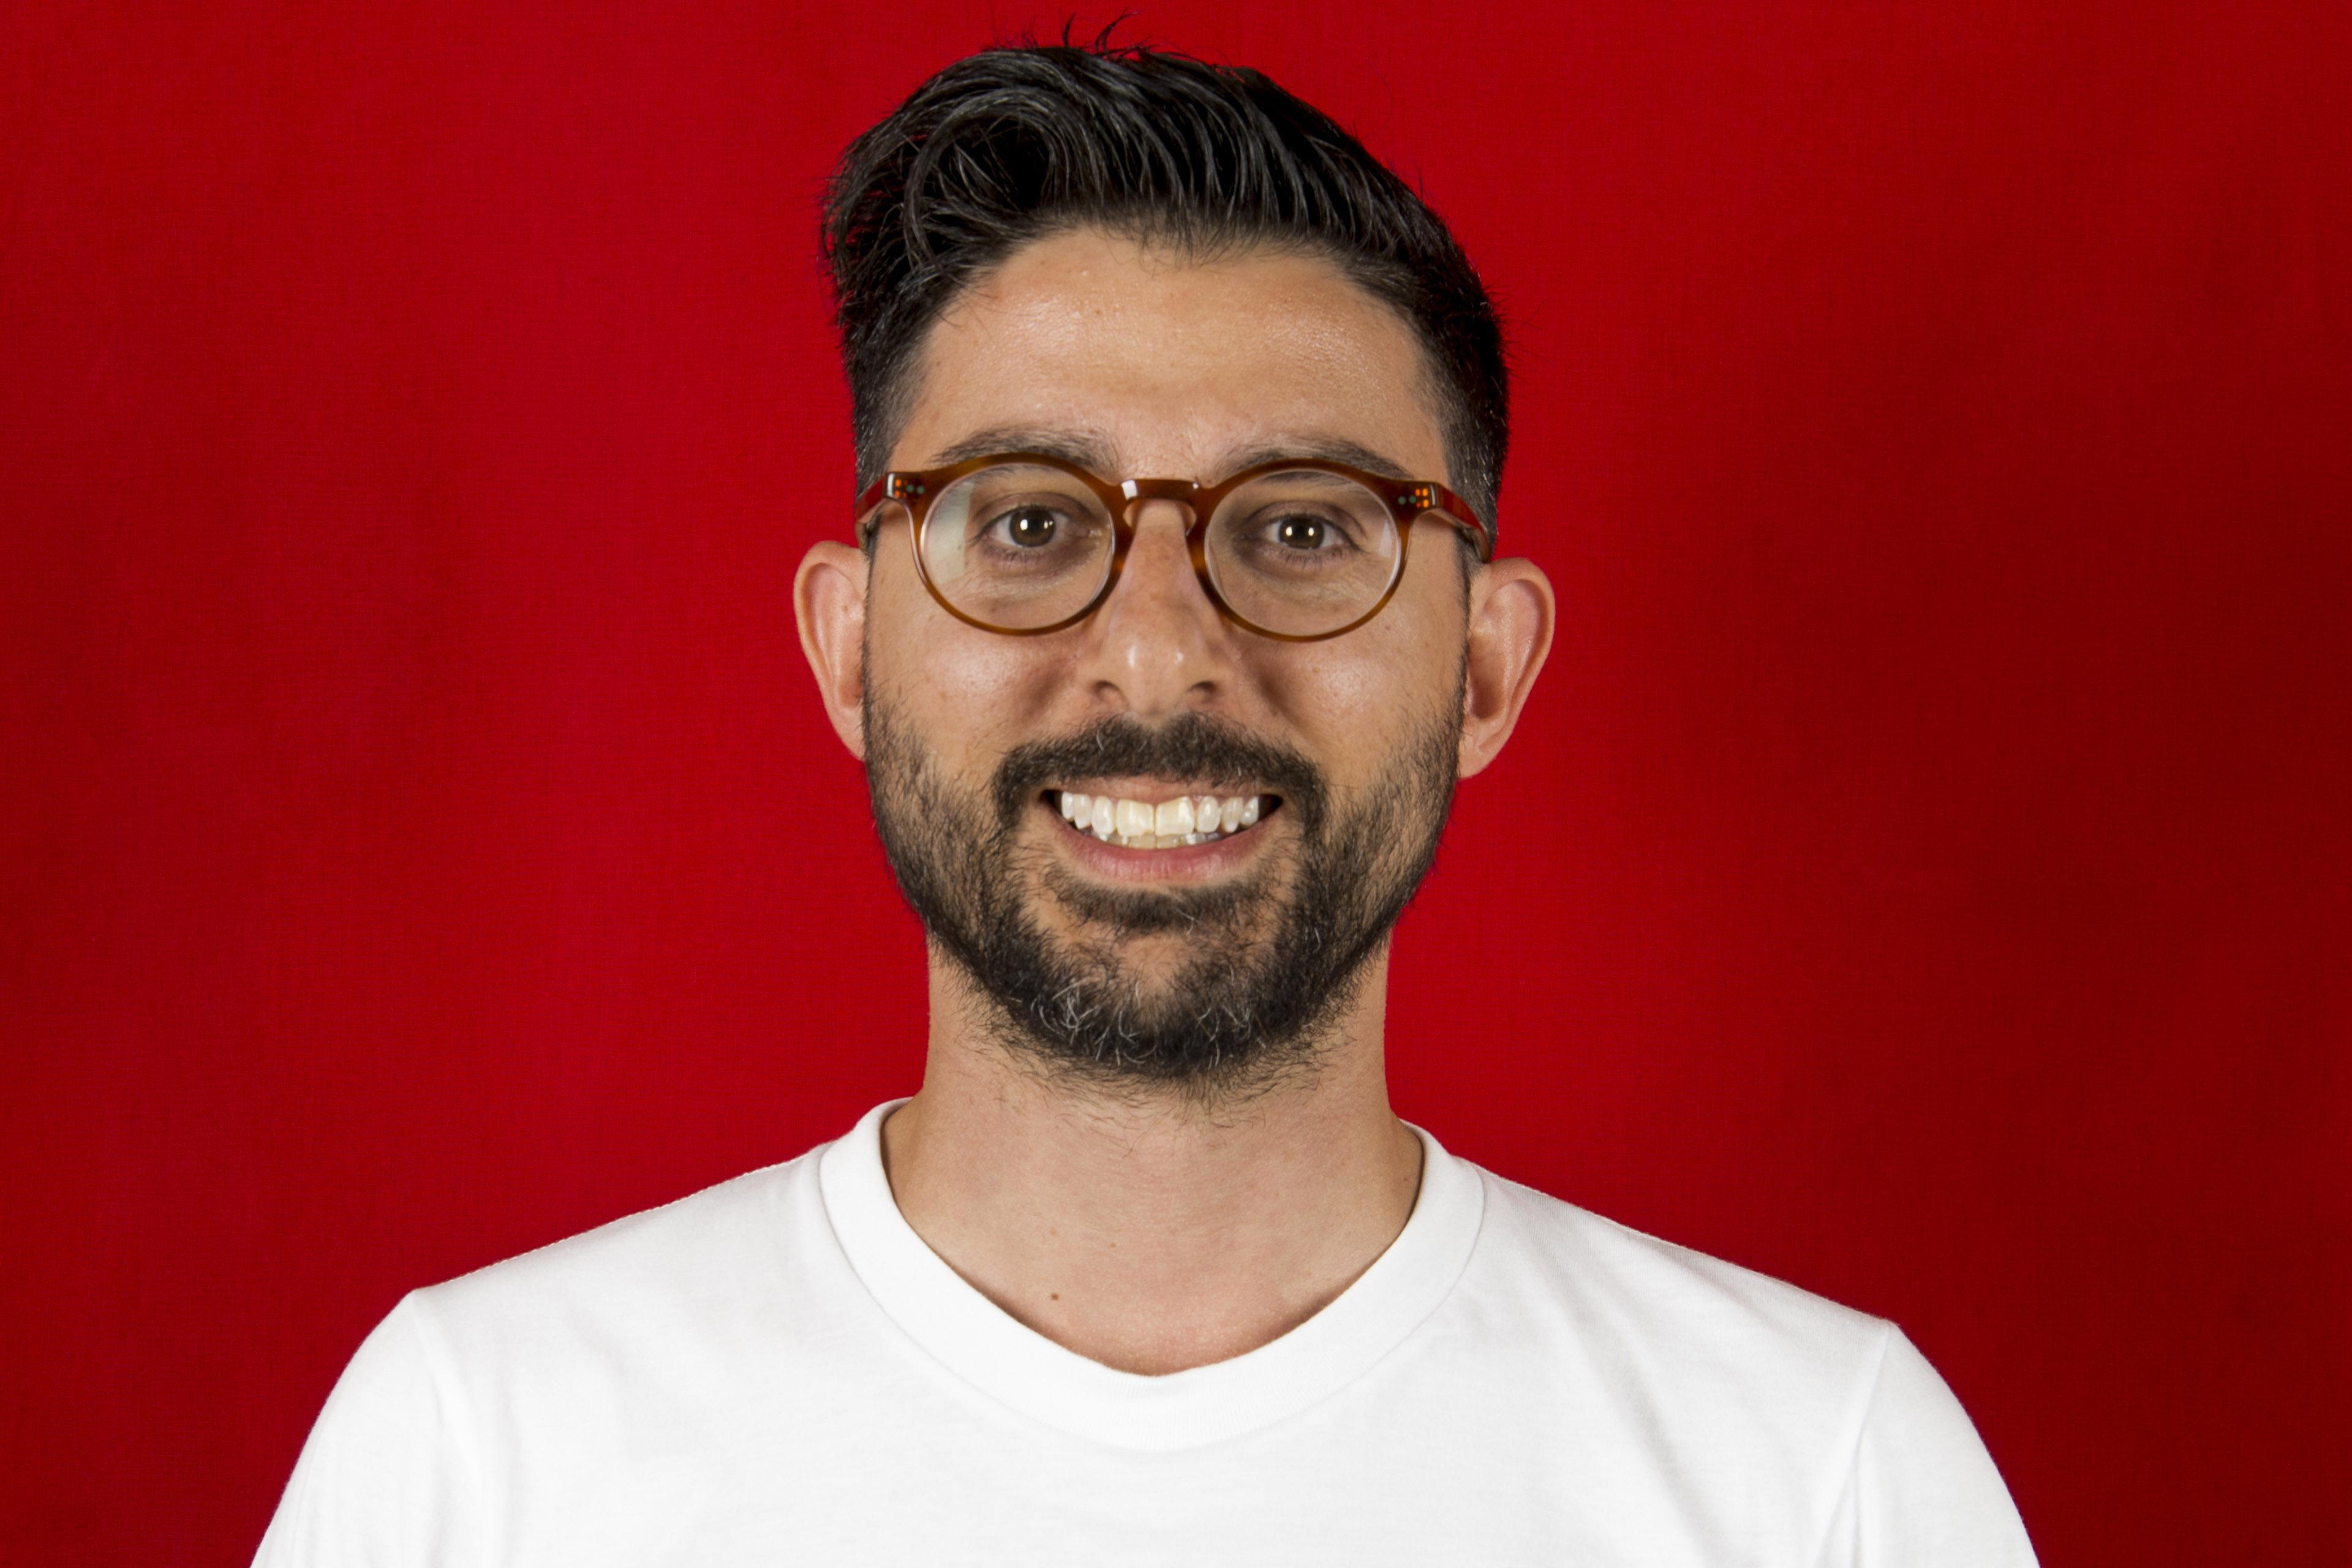 2019 Entrepreneur David Darmanin